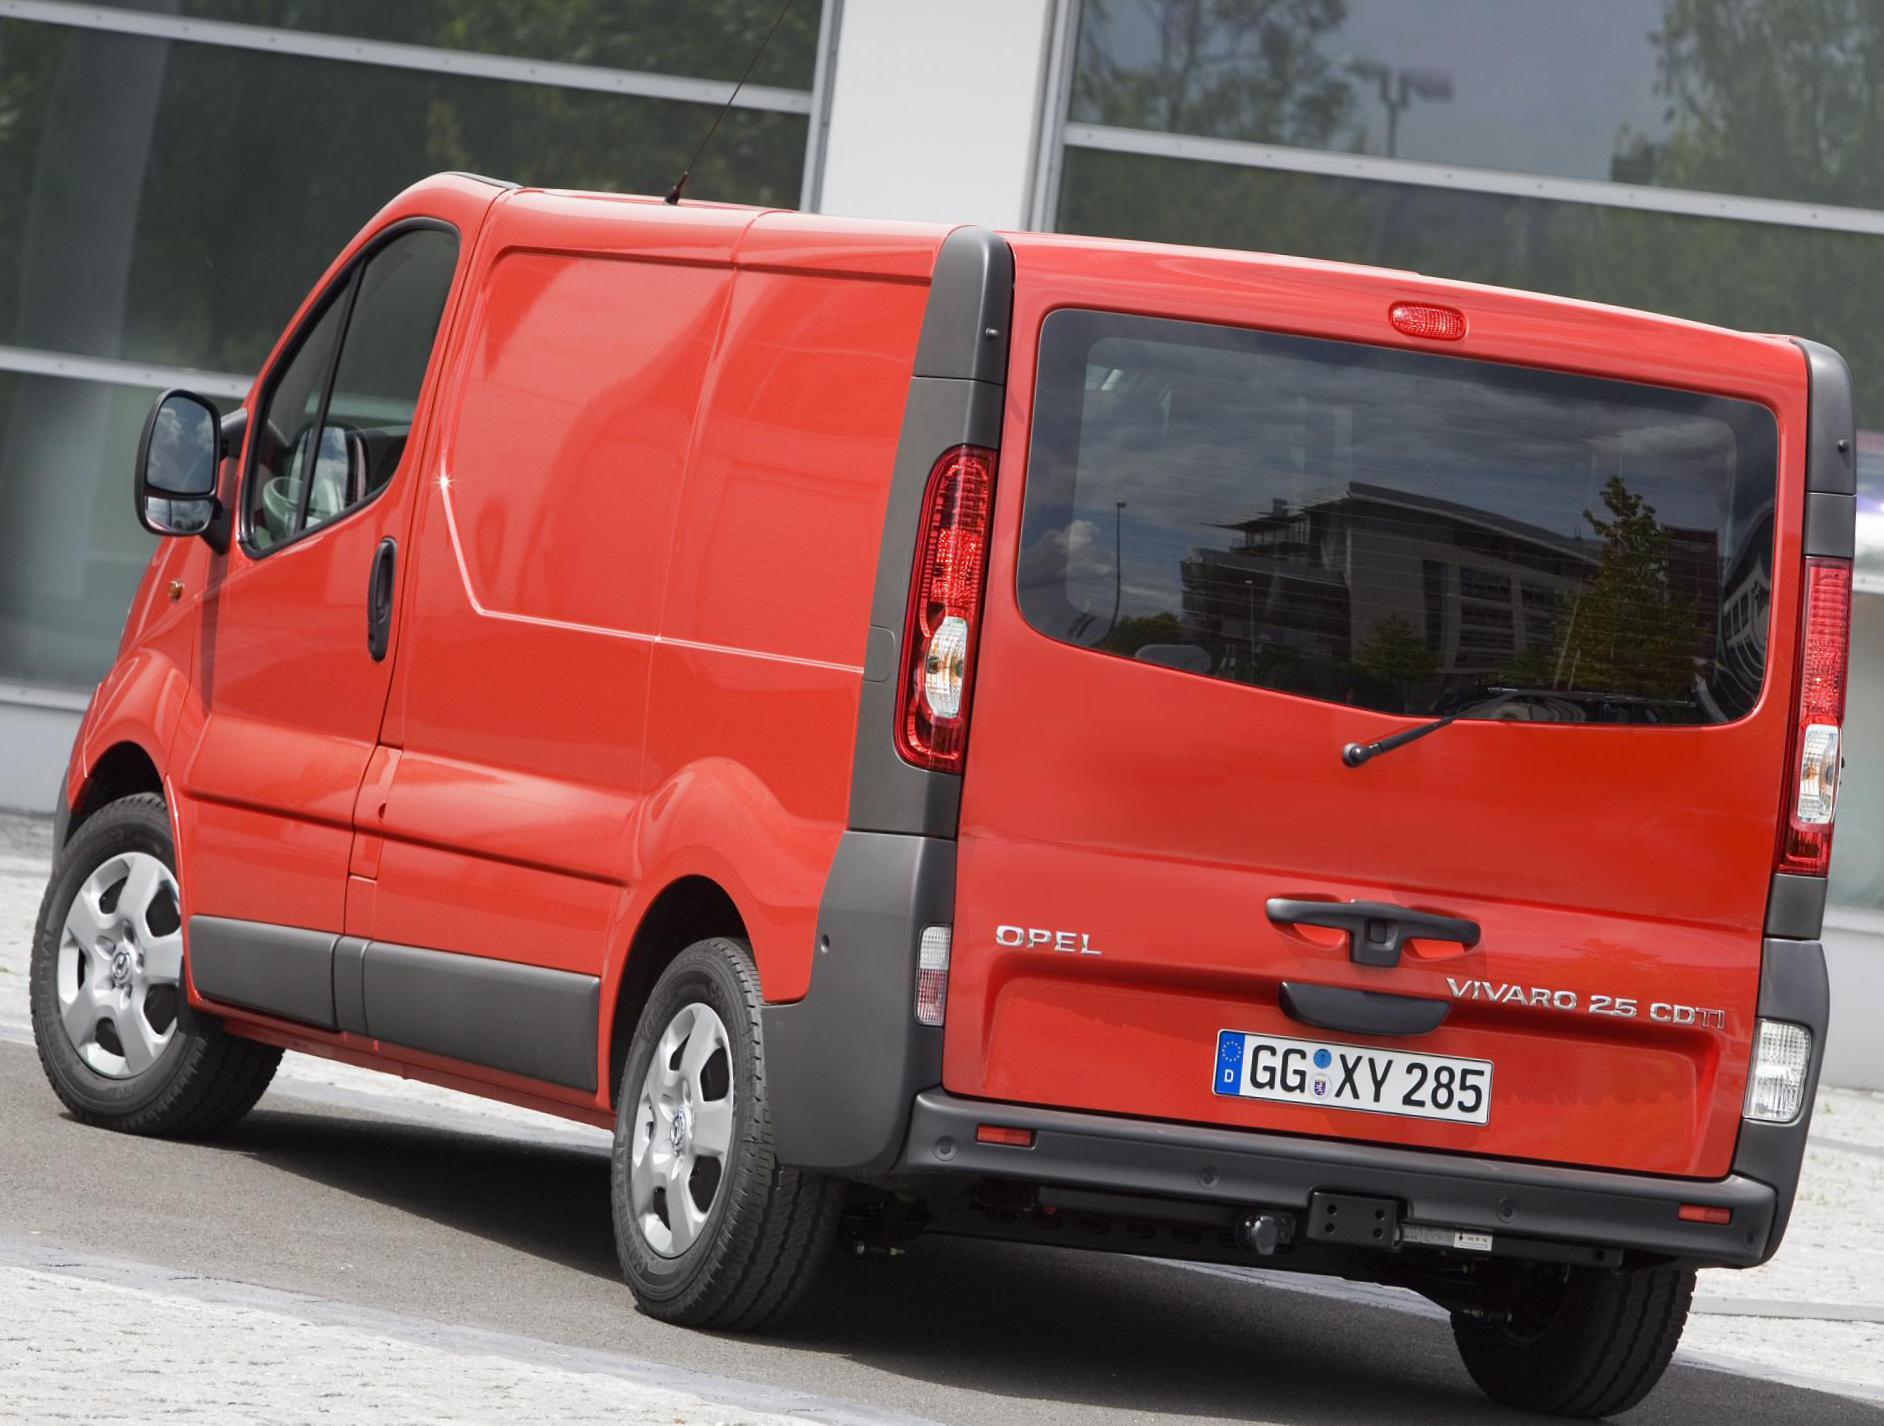 Betere Opel Vivaro Photos and Specs. Photo: Opel Vivaro tuning and 21 BL-75